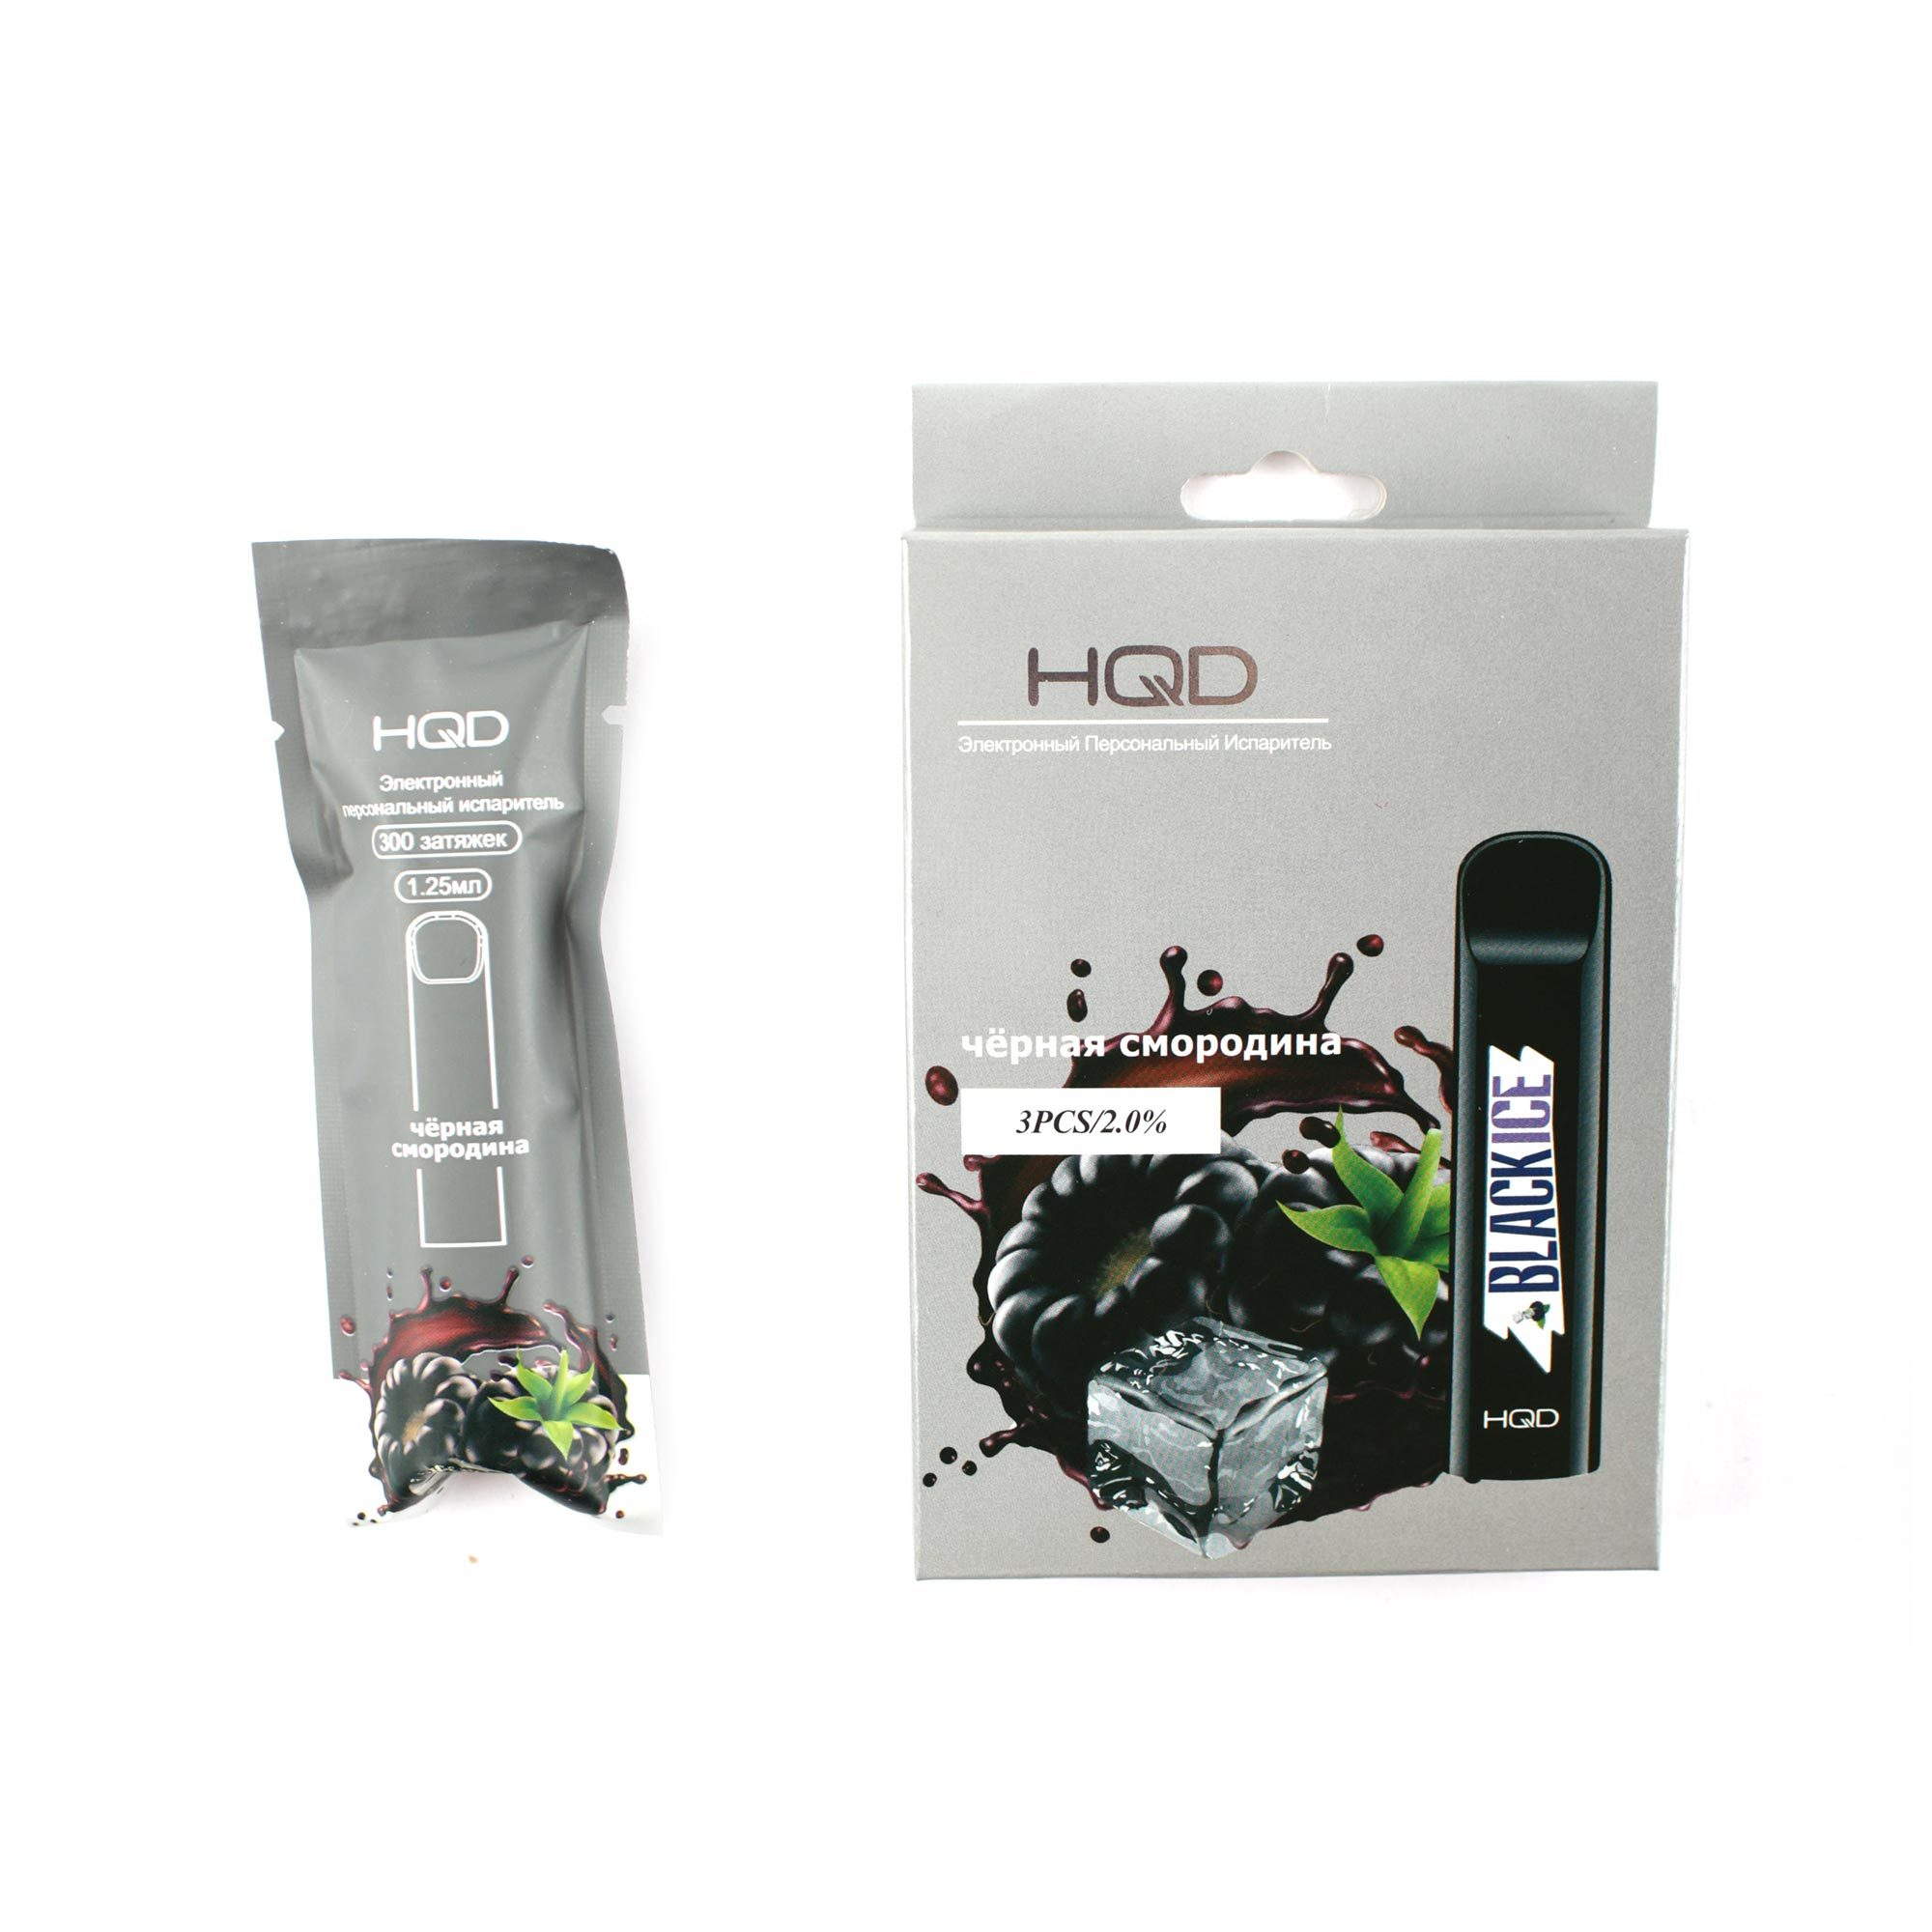 Одноразовая электронная сигарета HQD Blackberry (Черная смородина)